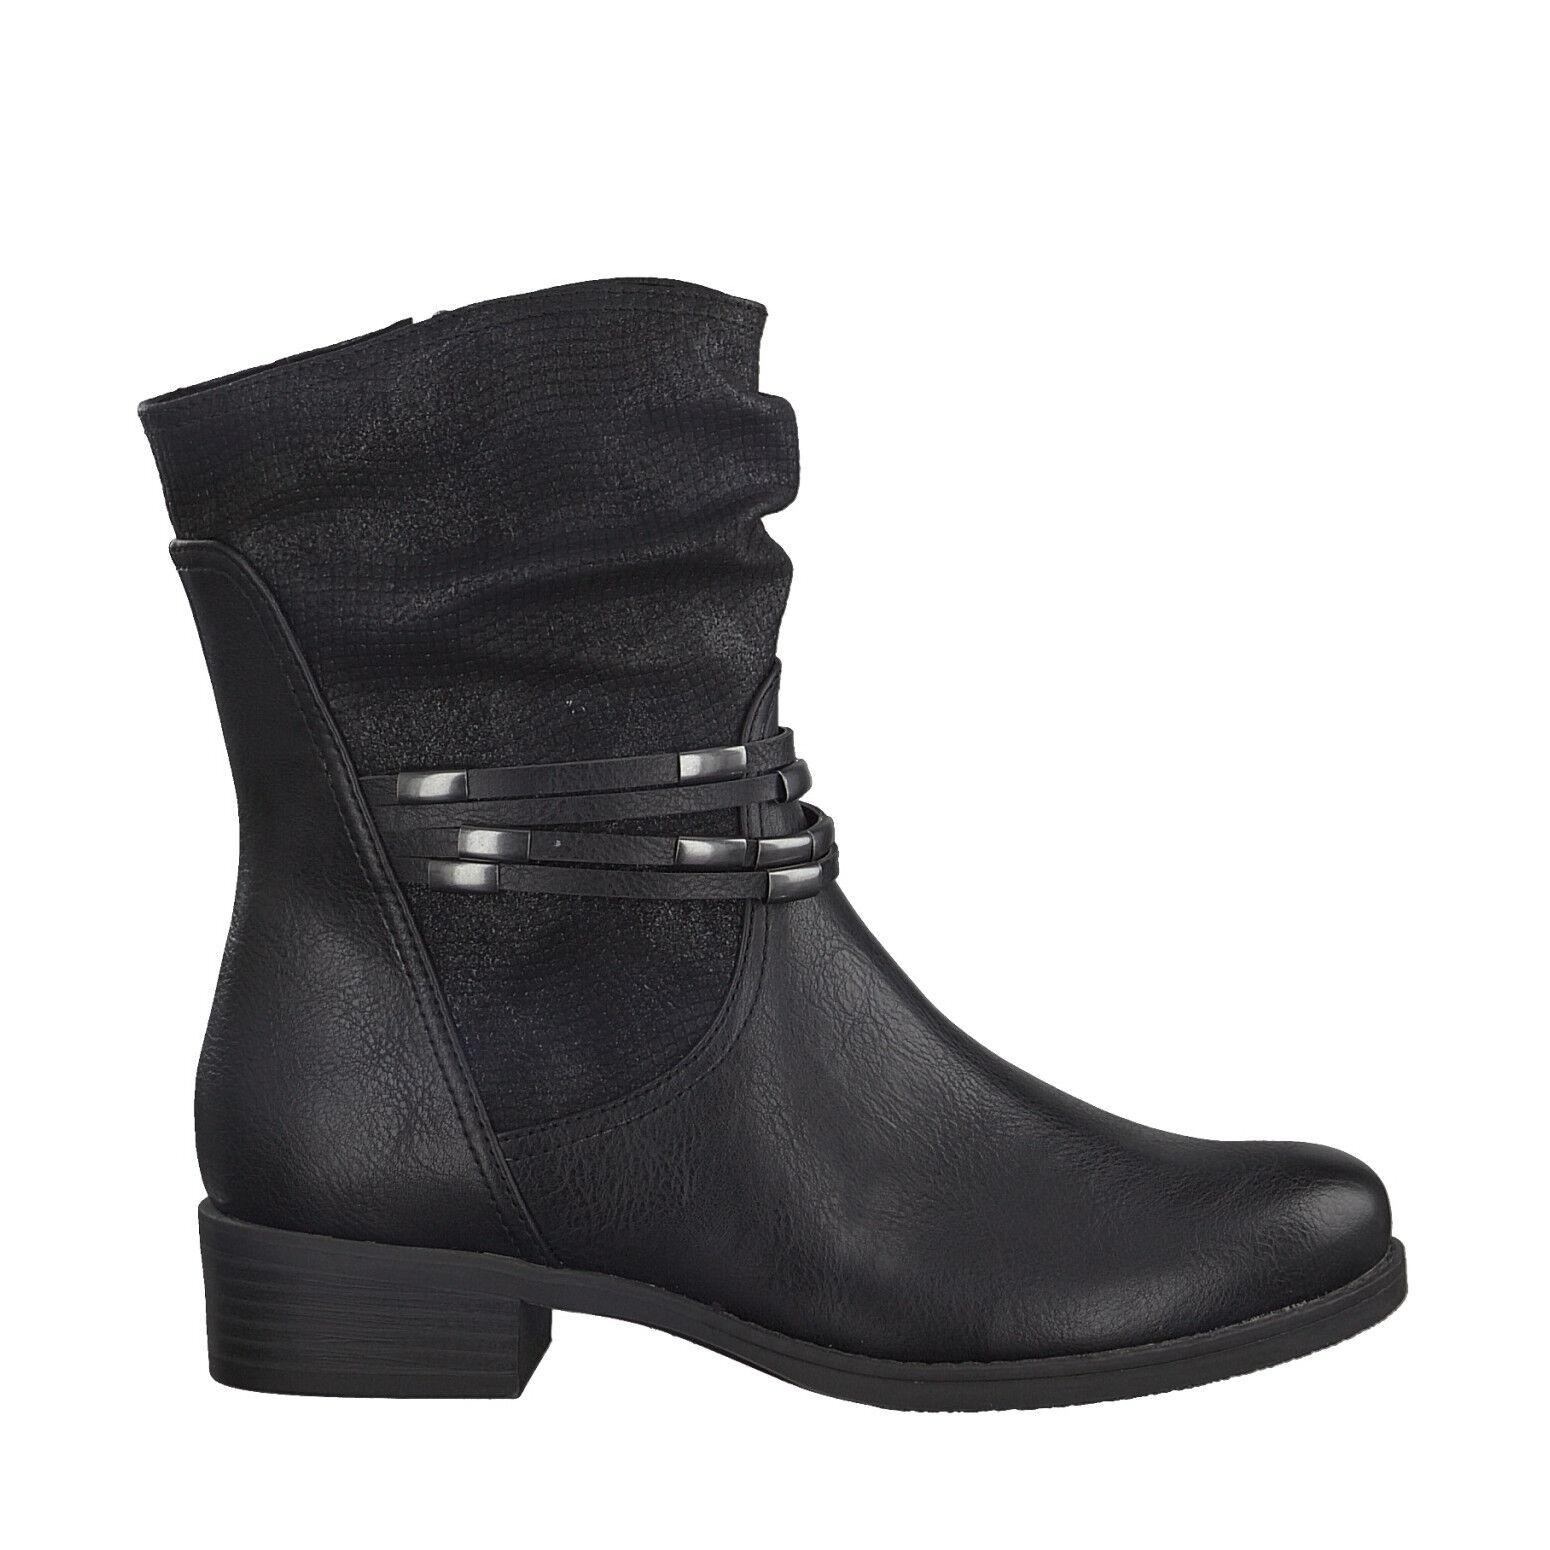 Marco Tozzi 2-2-25305-29 096 Damen Schuhe Biker Stiefel Stiefeletten schwarz